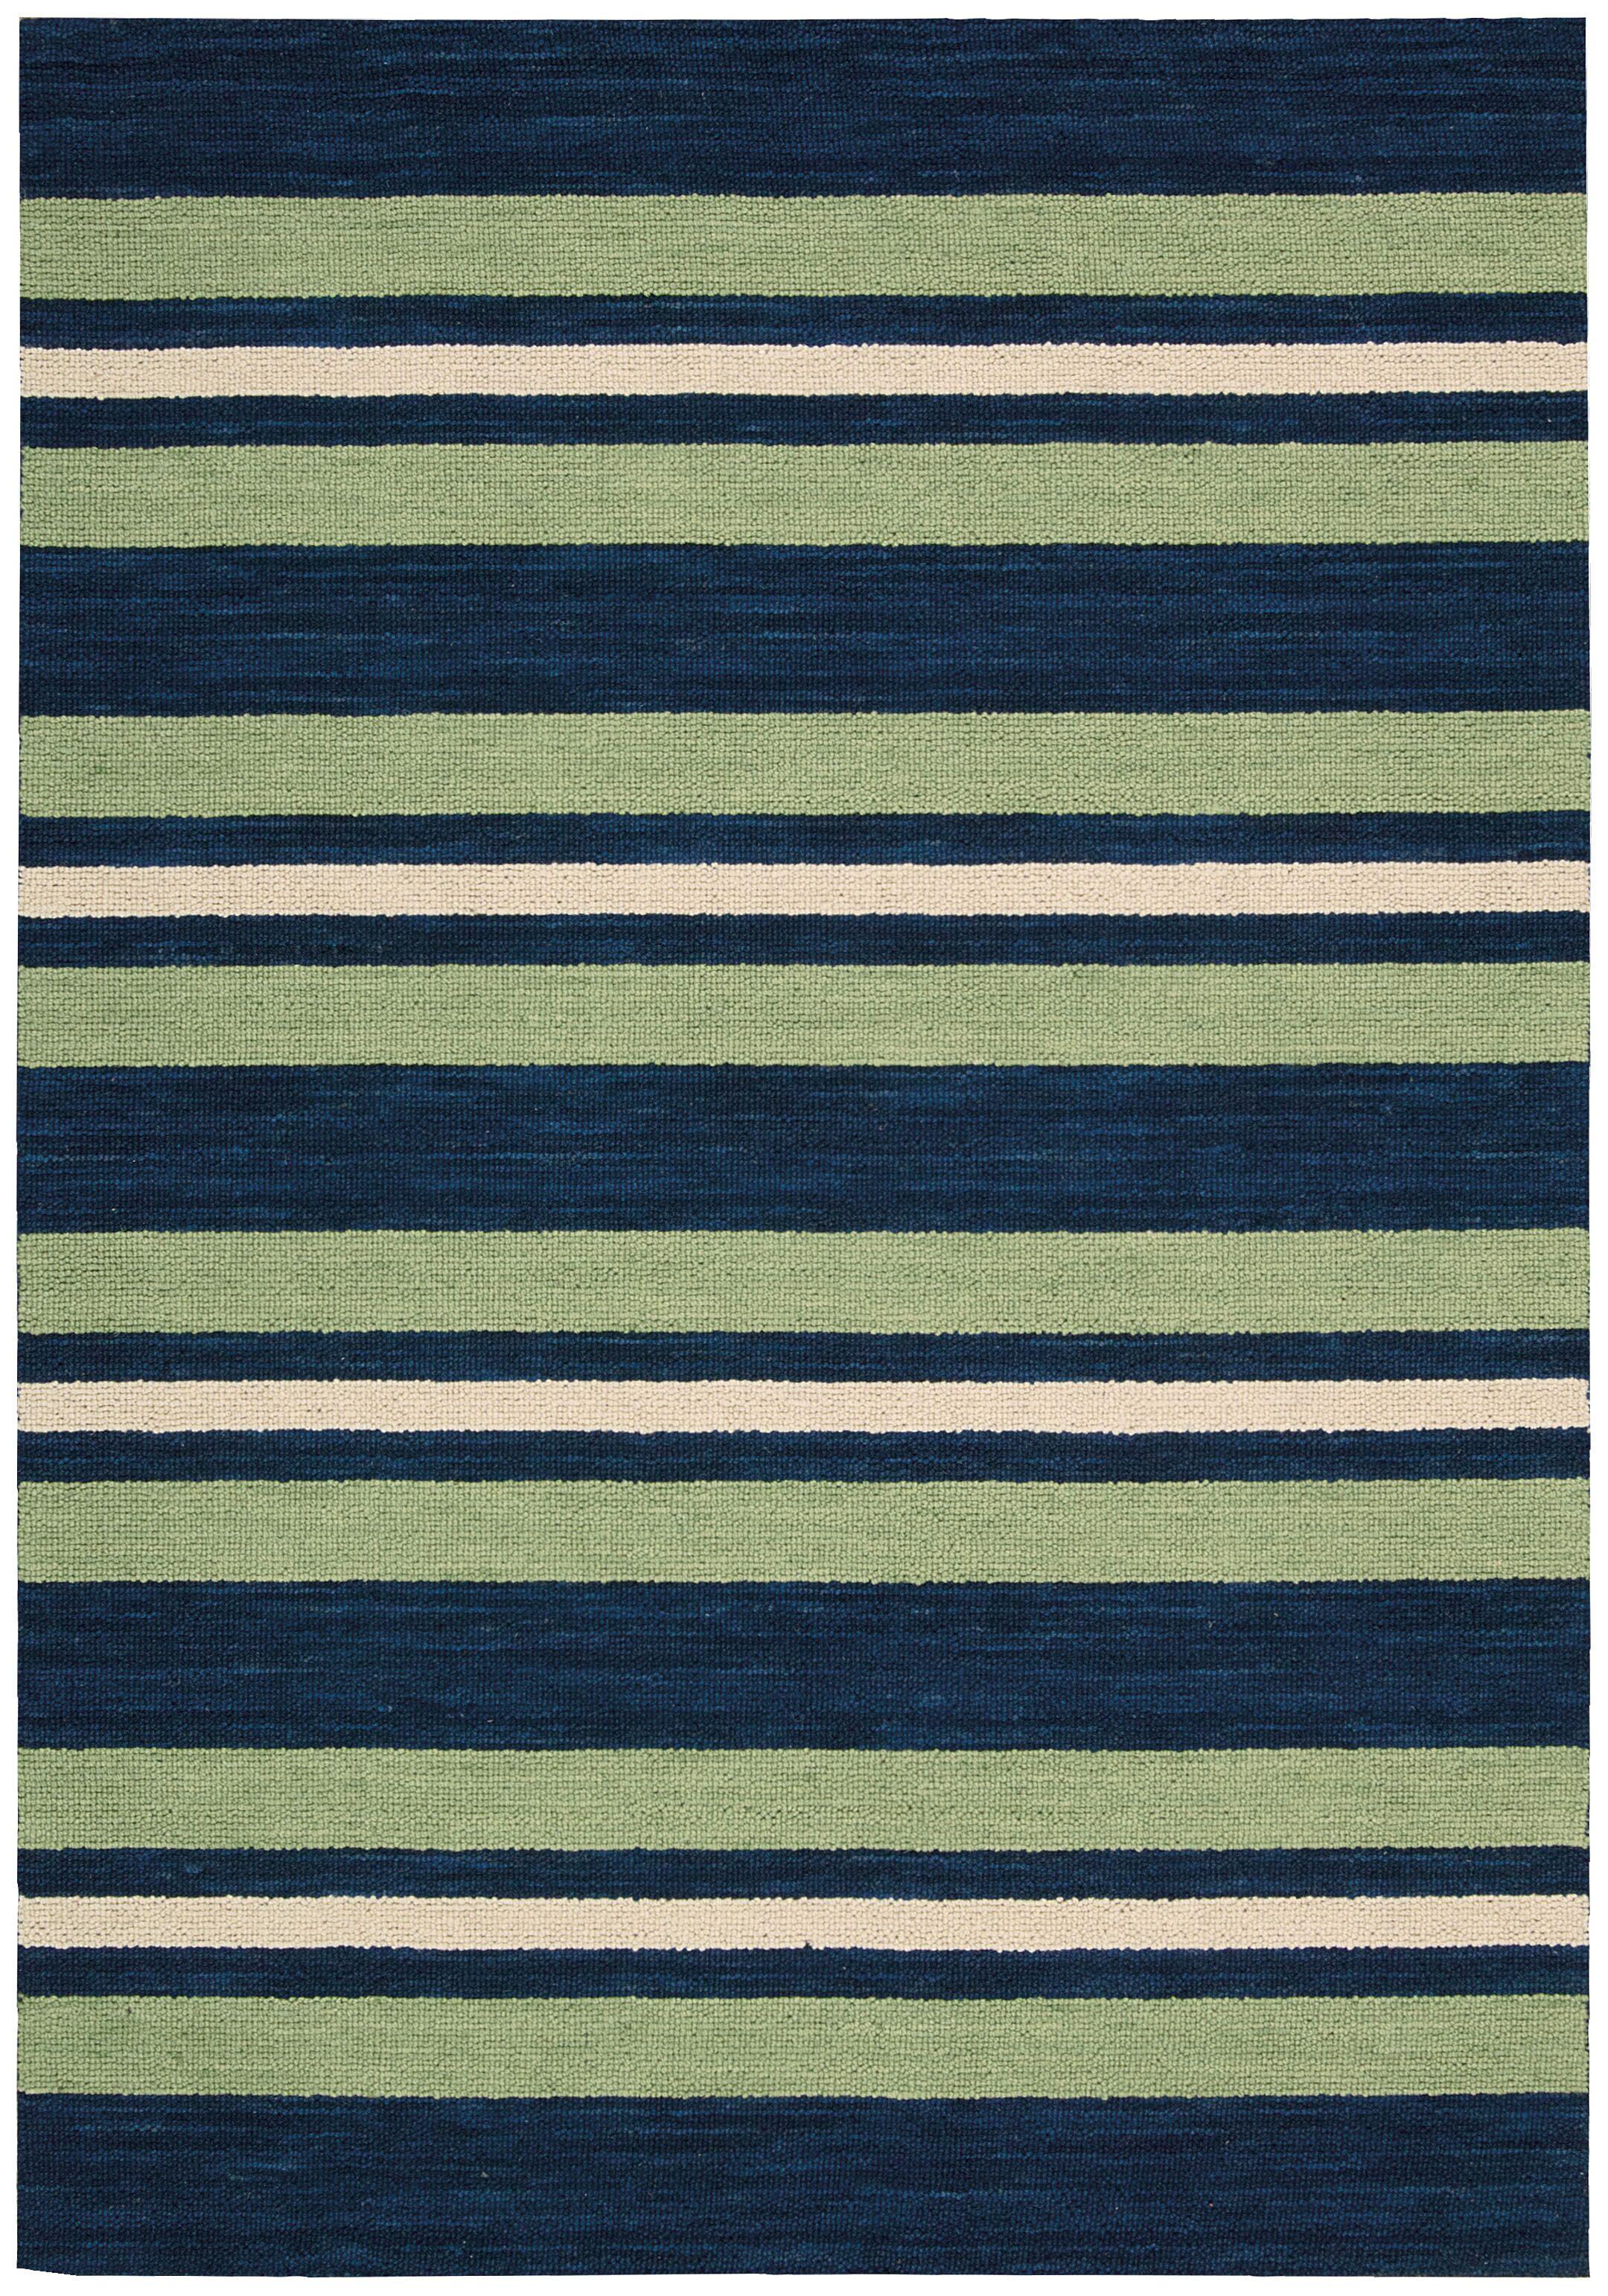 Oxford Handmade Green/Blue Area Rug Rug Size: Runner 2'3